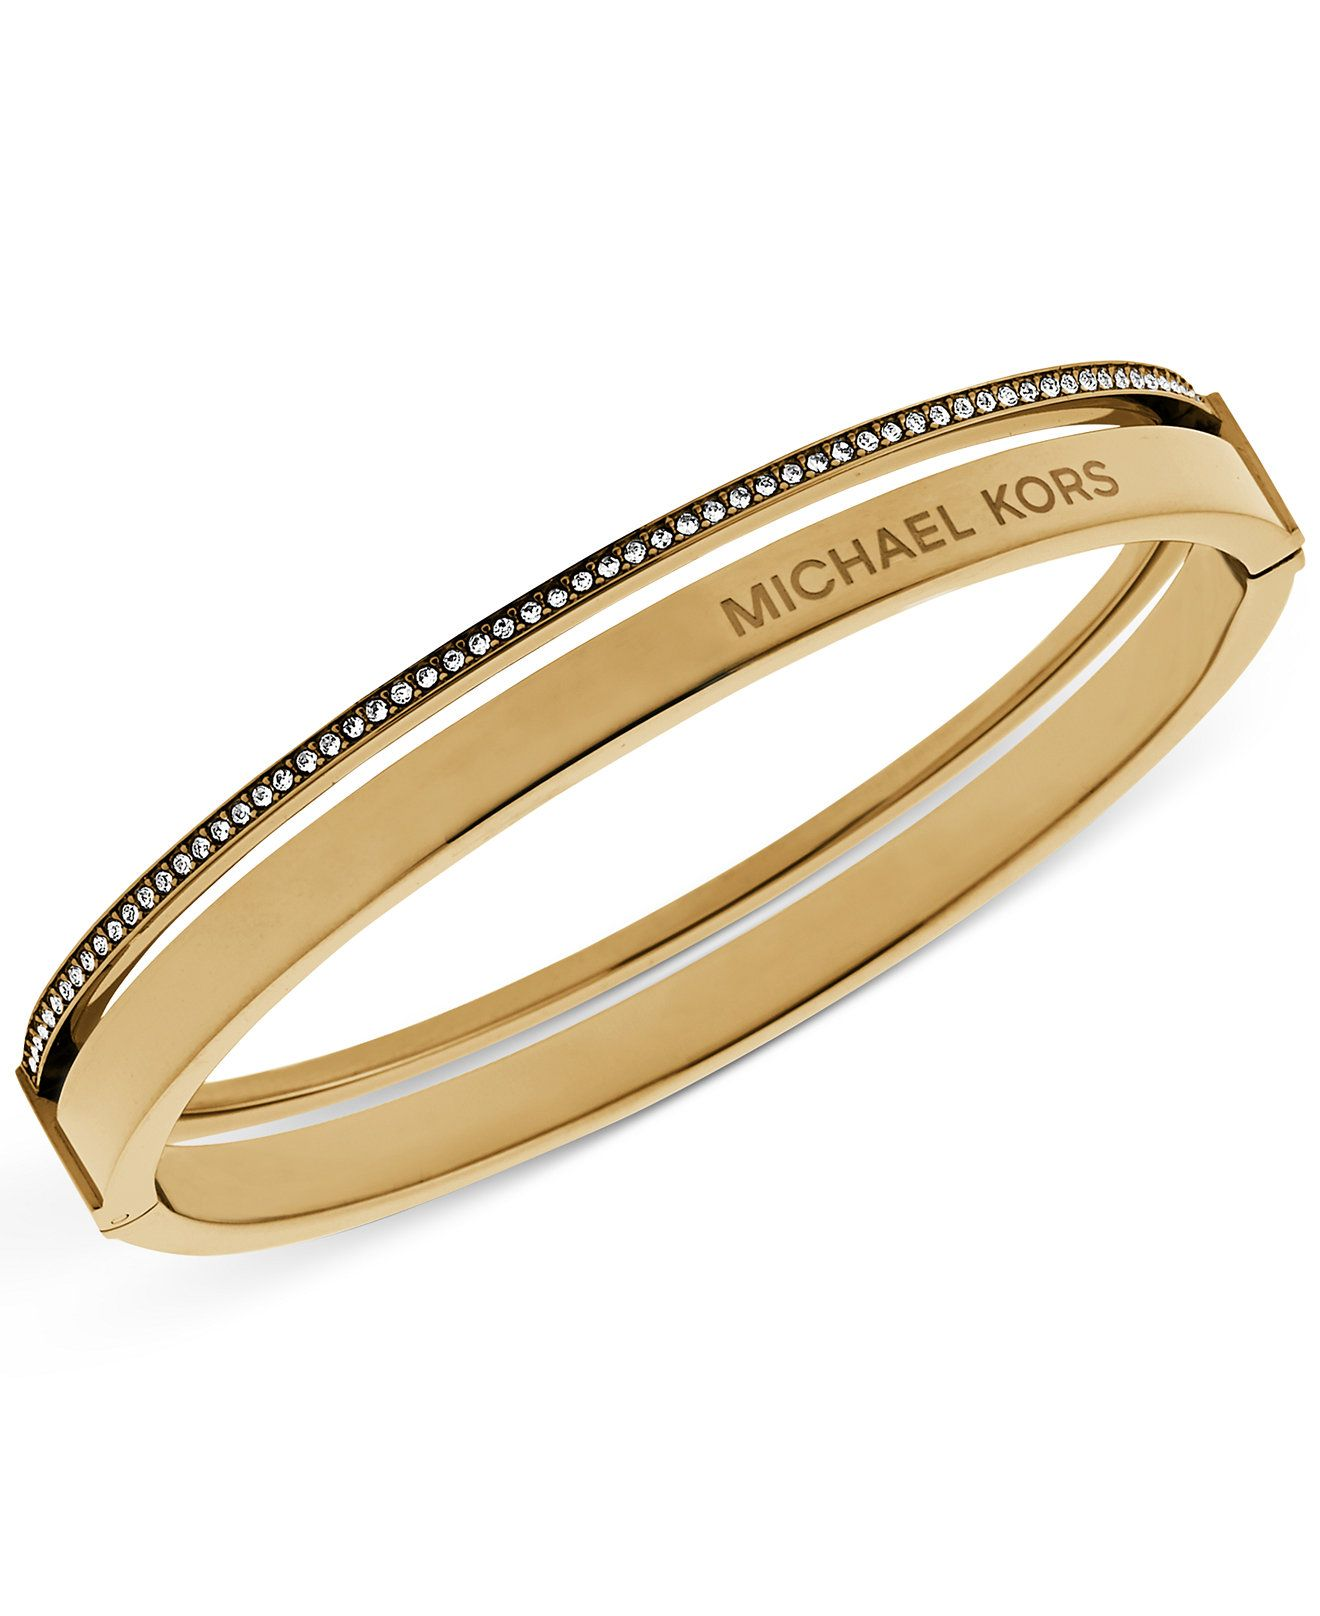 Michael Kors Crystal Split Bangle Bracelet - Michael Kors ...